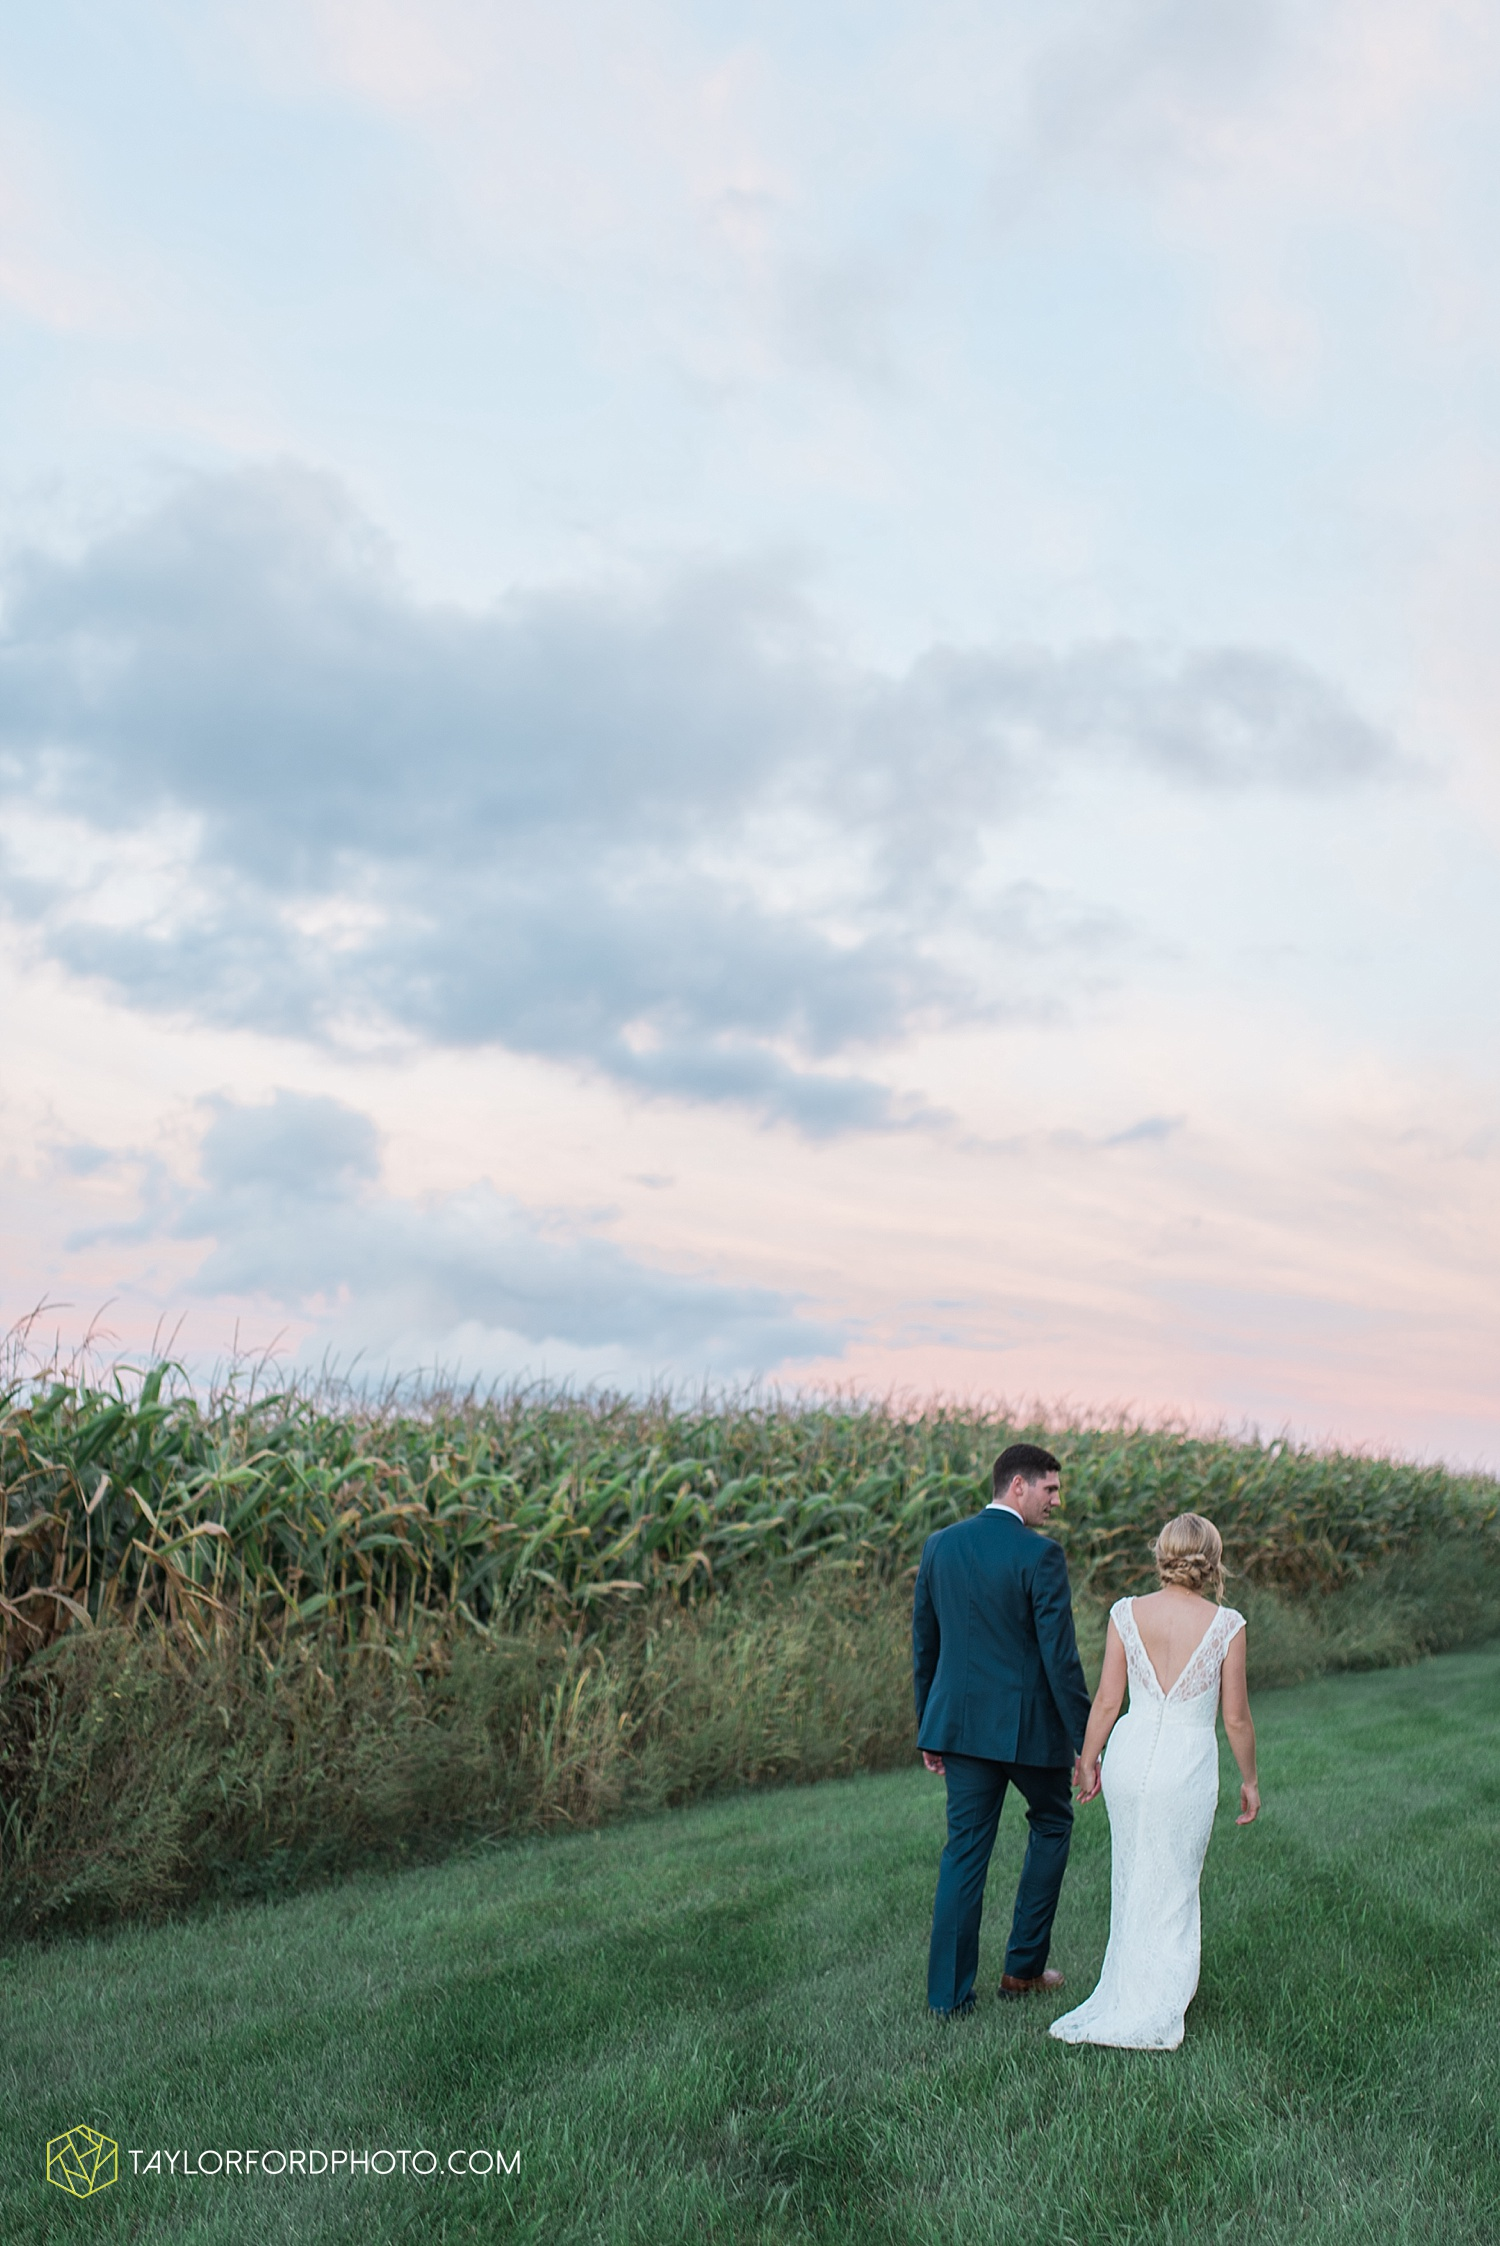 fort_wayne_indiana_van_wert_columbus_ohio_nashville_tennessee_photographer_taylor_ford_shoppes_at_old_mill_wedding_0741.jpg